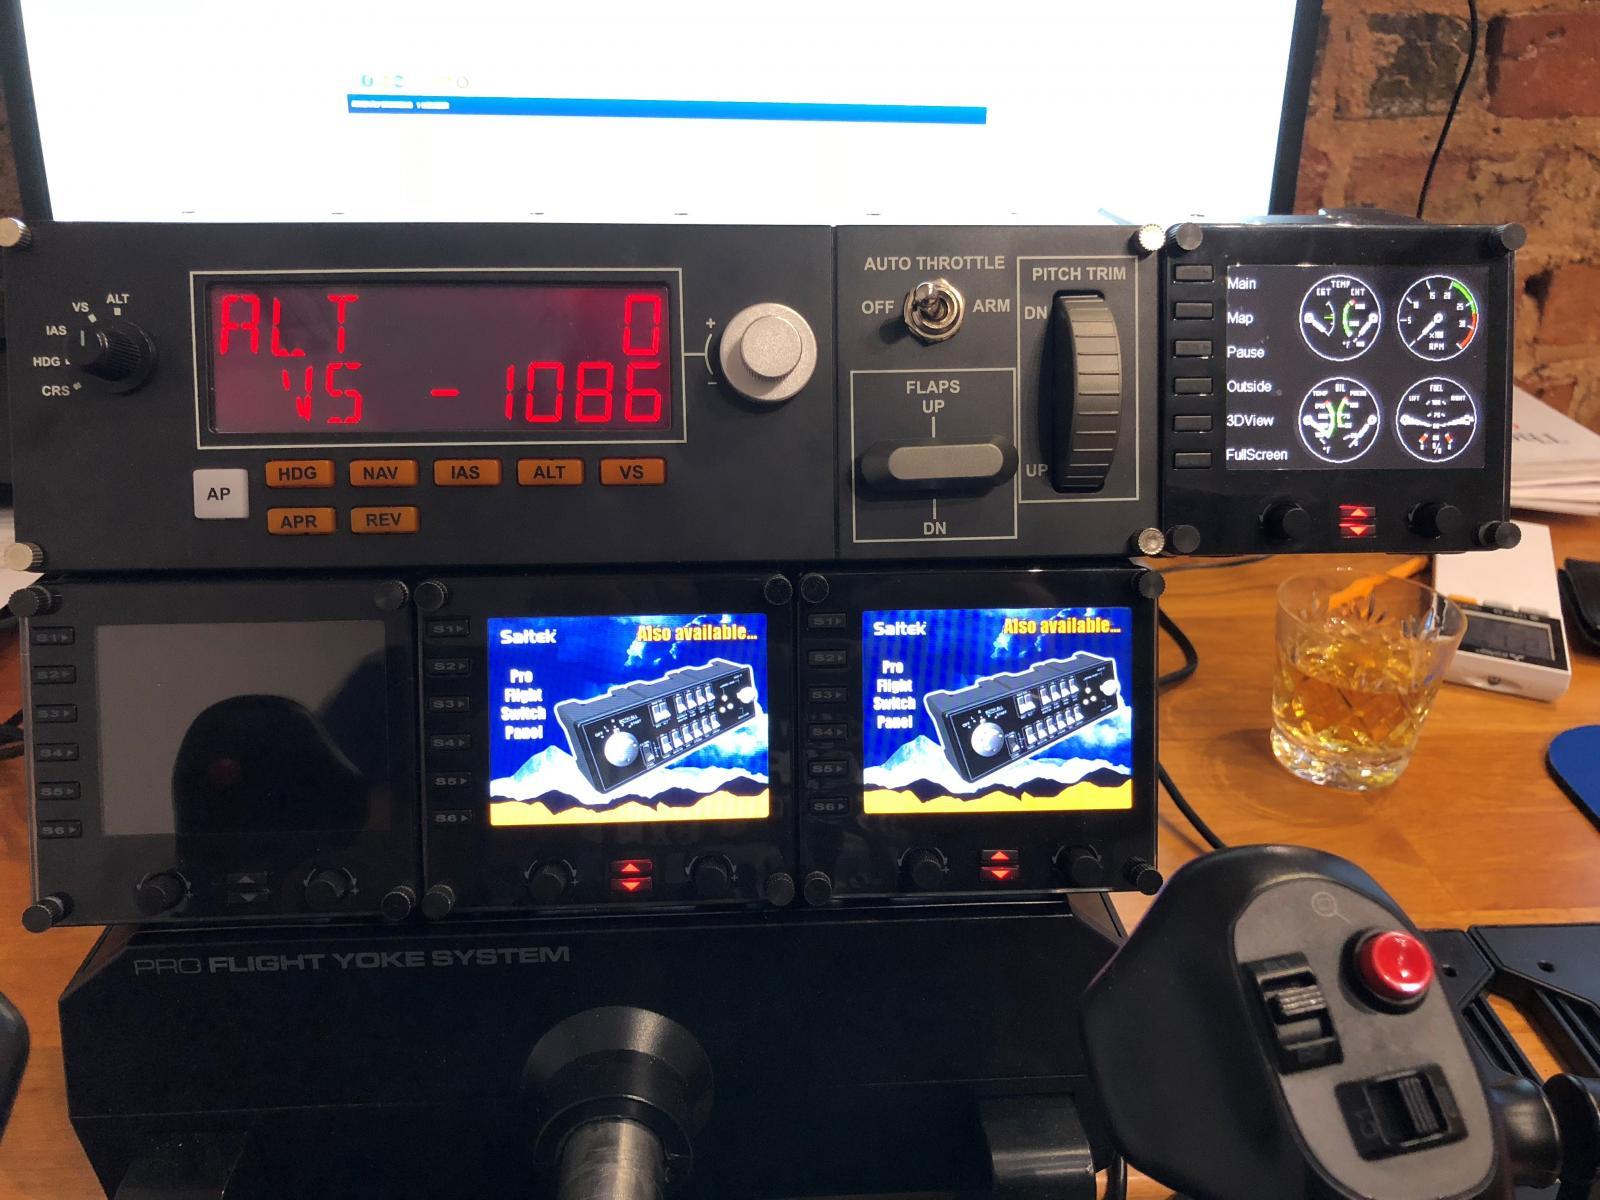 Logitech Saitek Pro Flight Instrument Panel